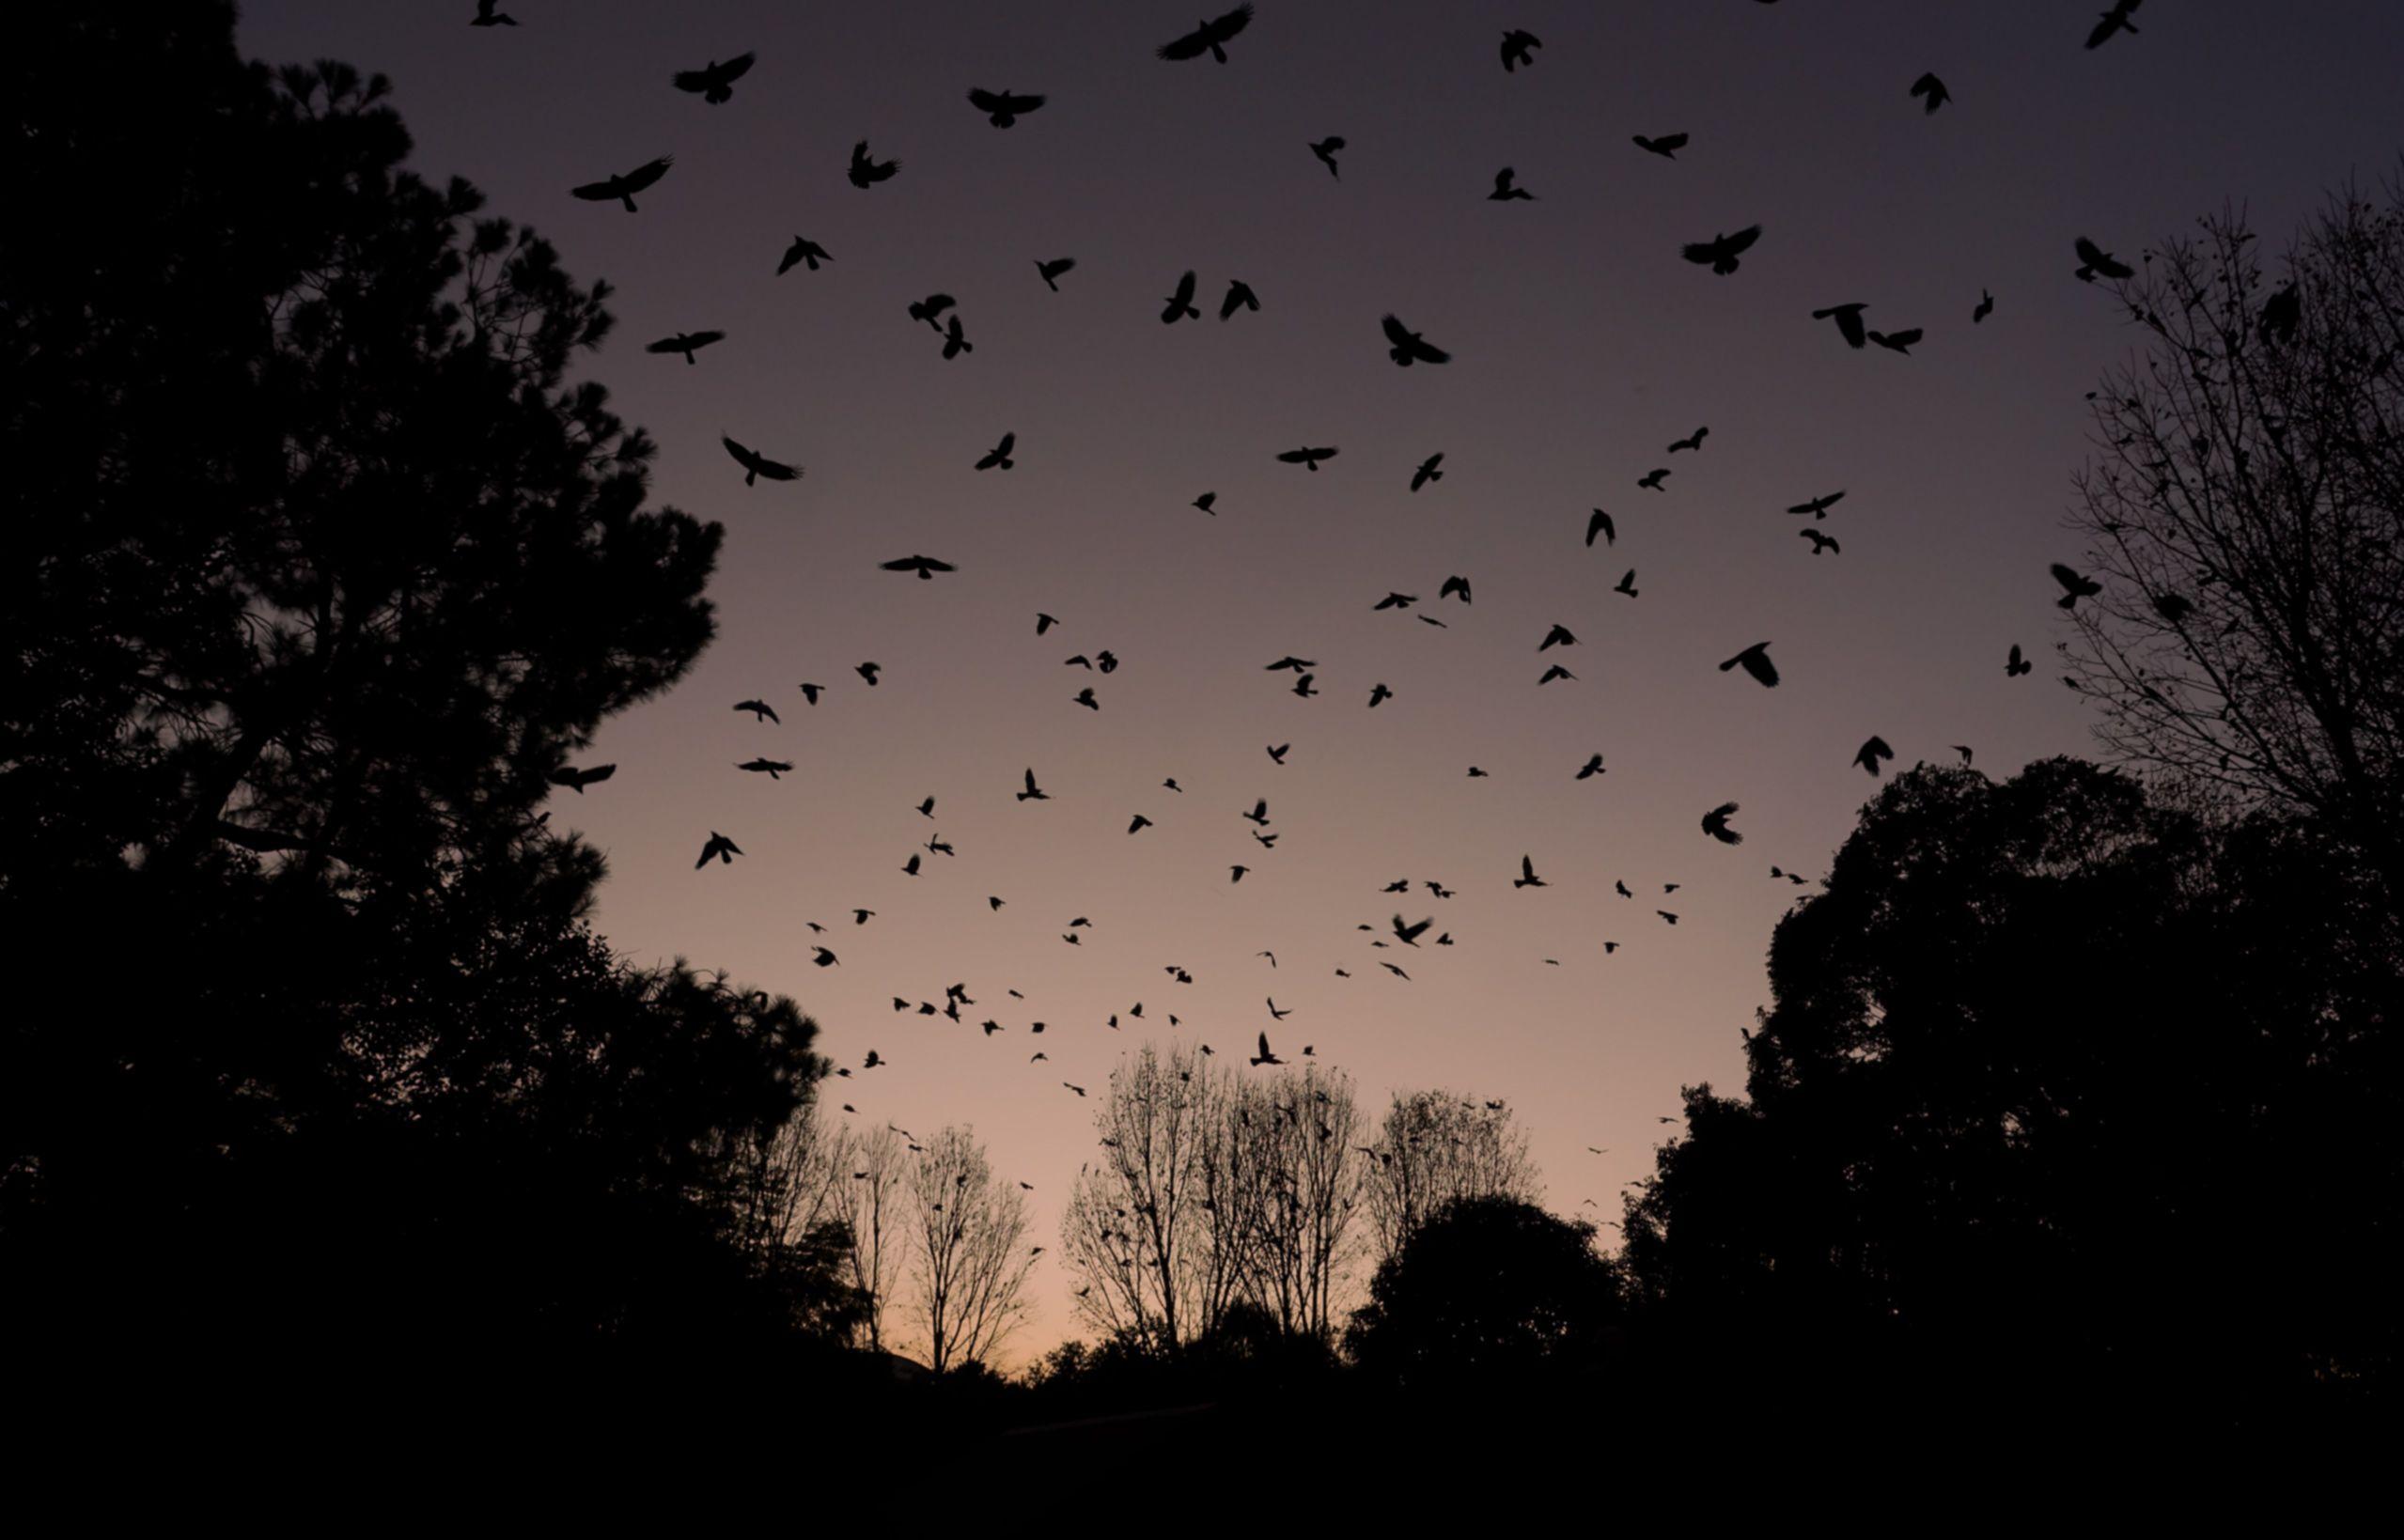 Kathmandu-Crows.jpg